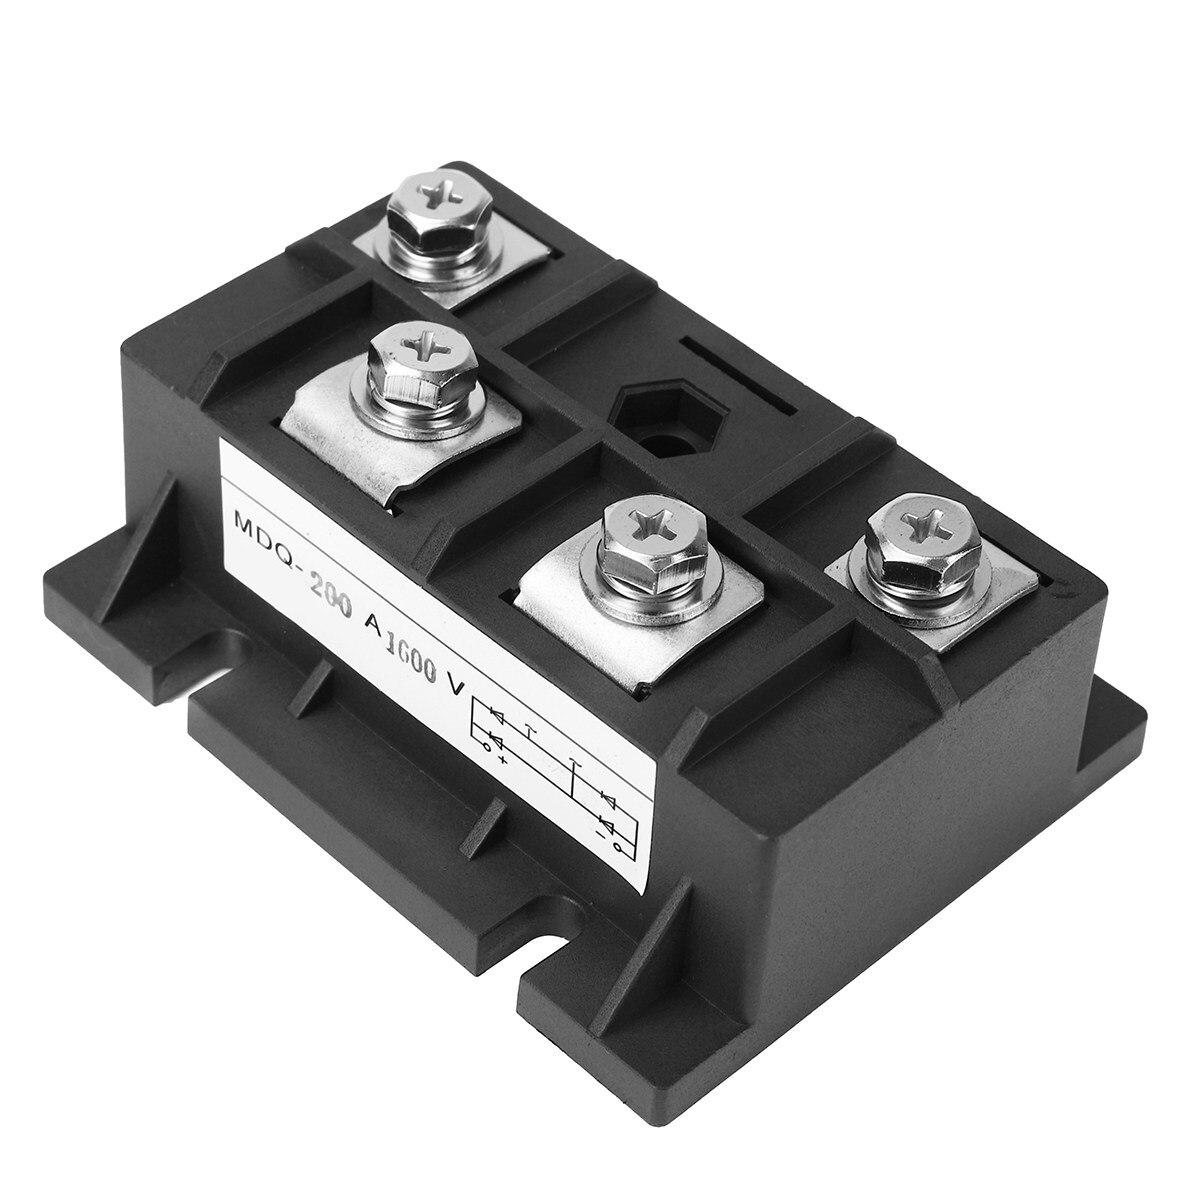 chỉnh lưu trên 1 diode - 1PC 122241581320 150A 1600V Diode Module Single Phase Bridge Rectifier MDQ-200A Rectifiers Electronic Components & Supplies